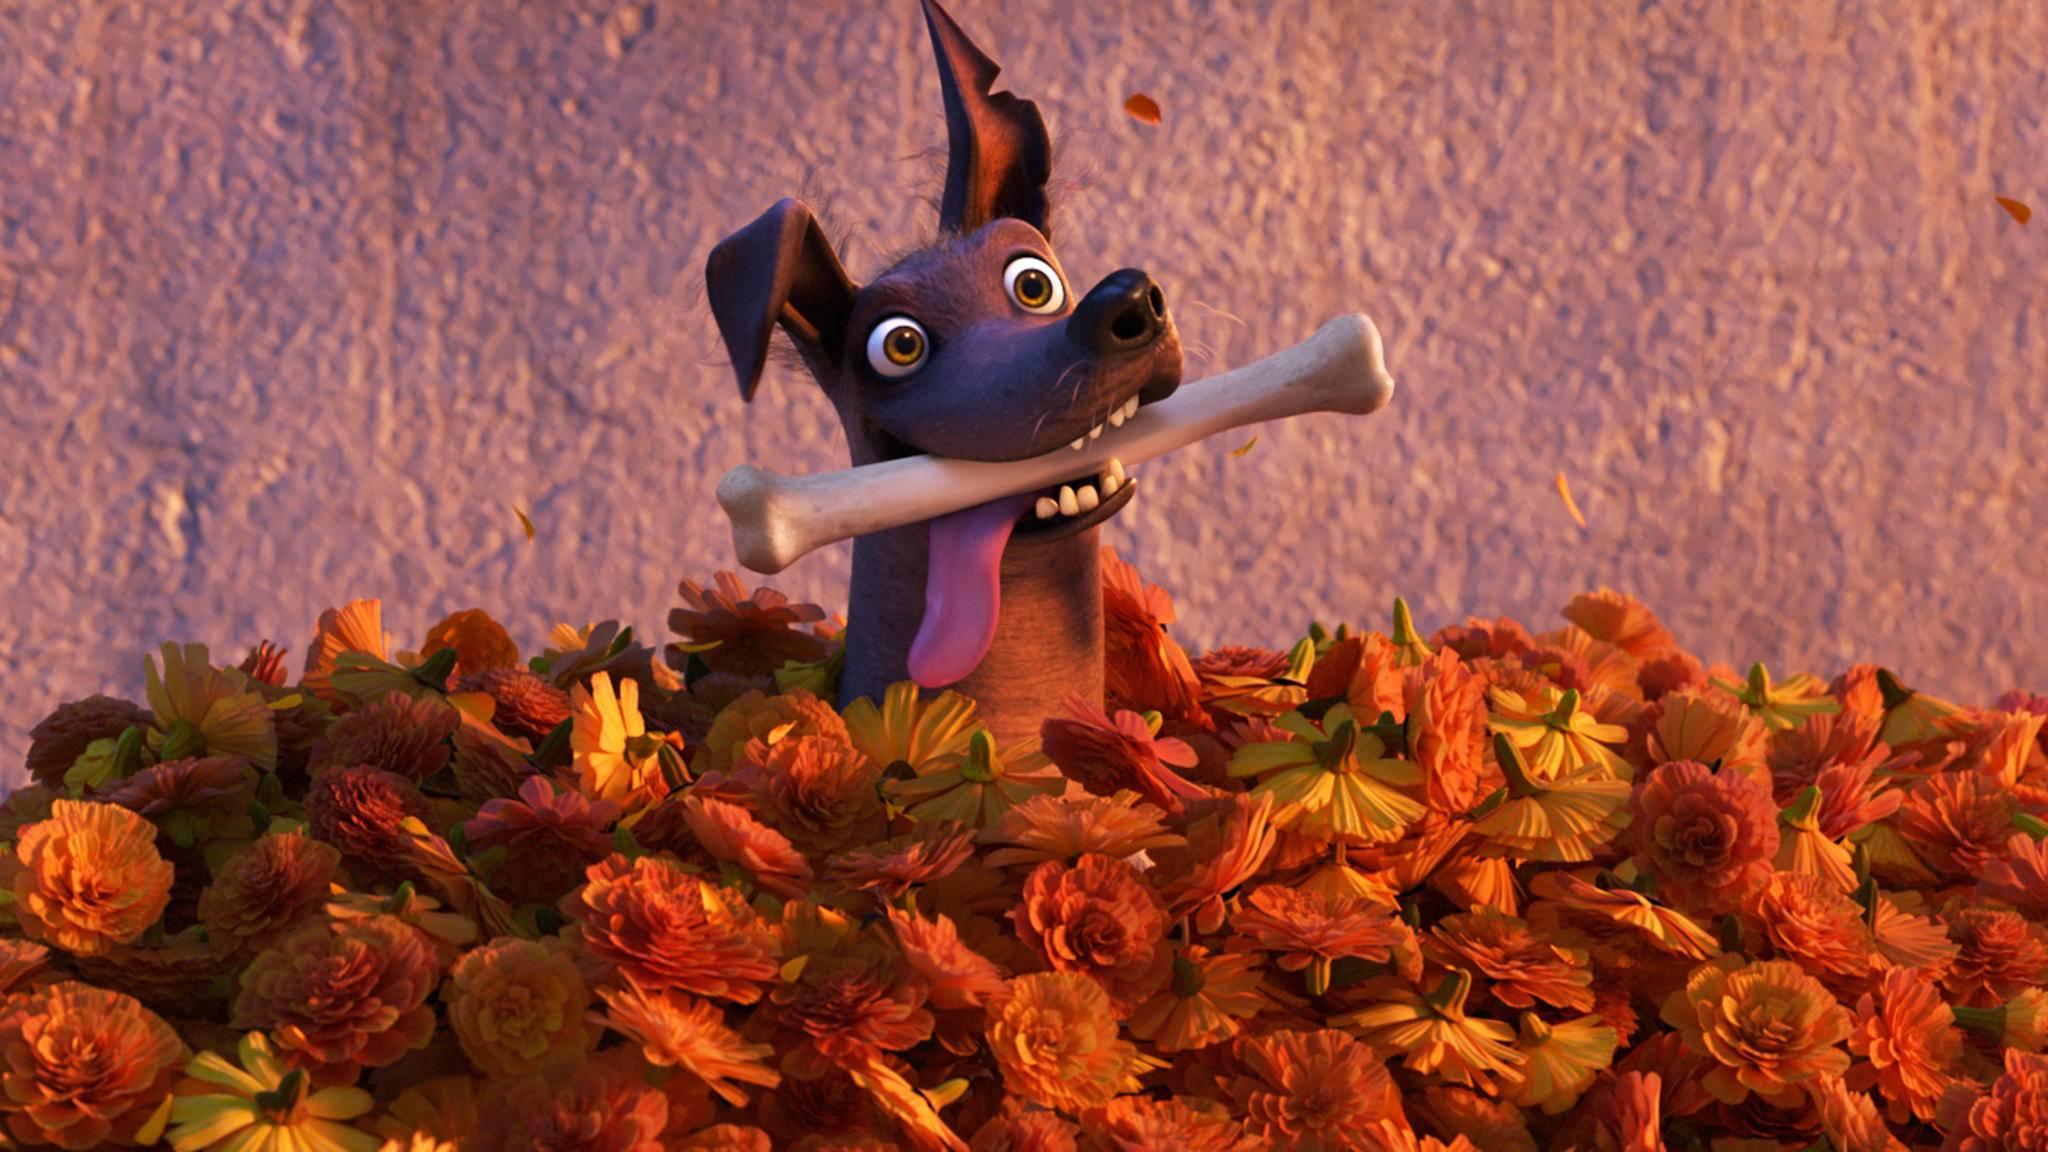 Coco-Lebendiger als das Leben-Dante-Disney-Pixar